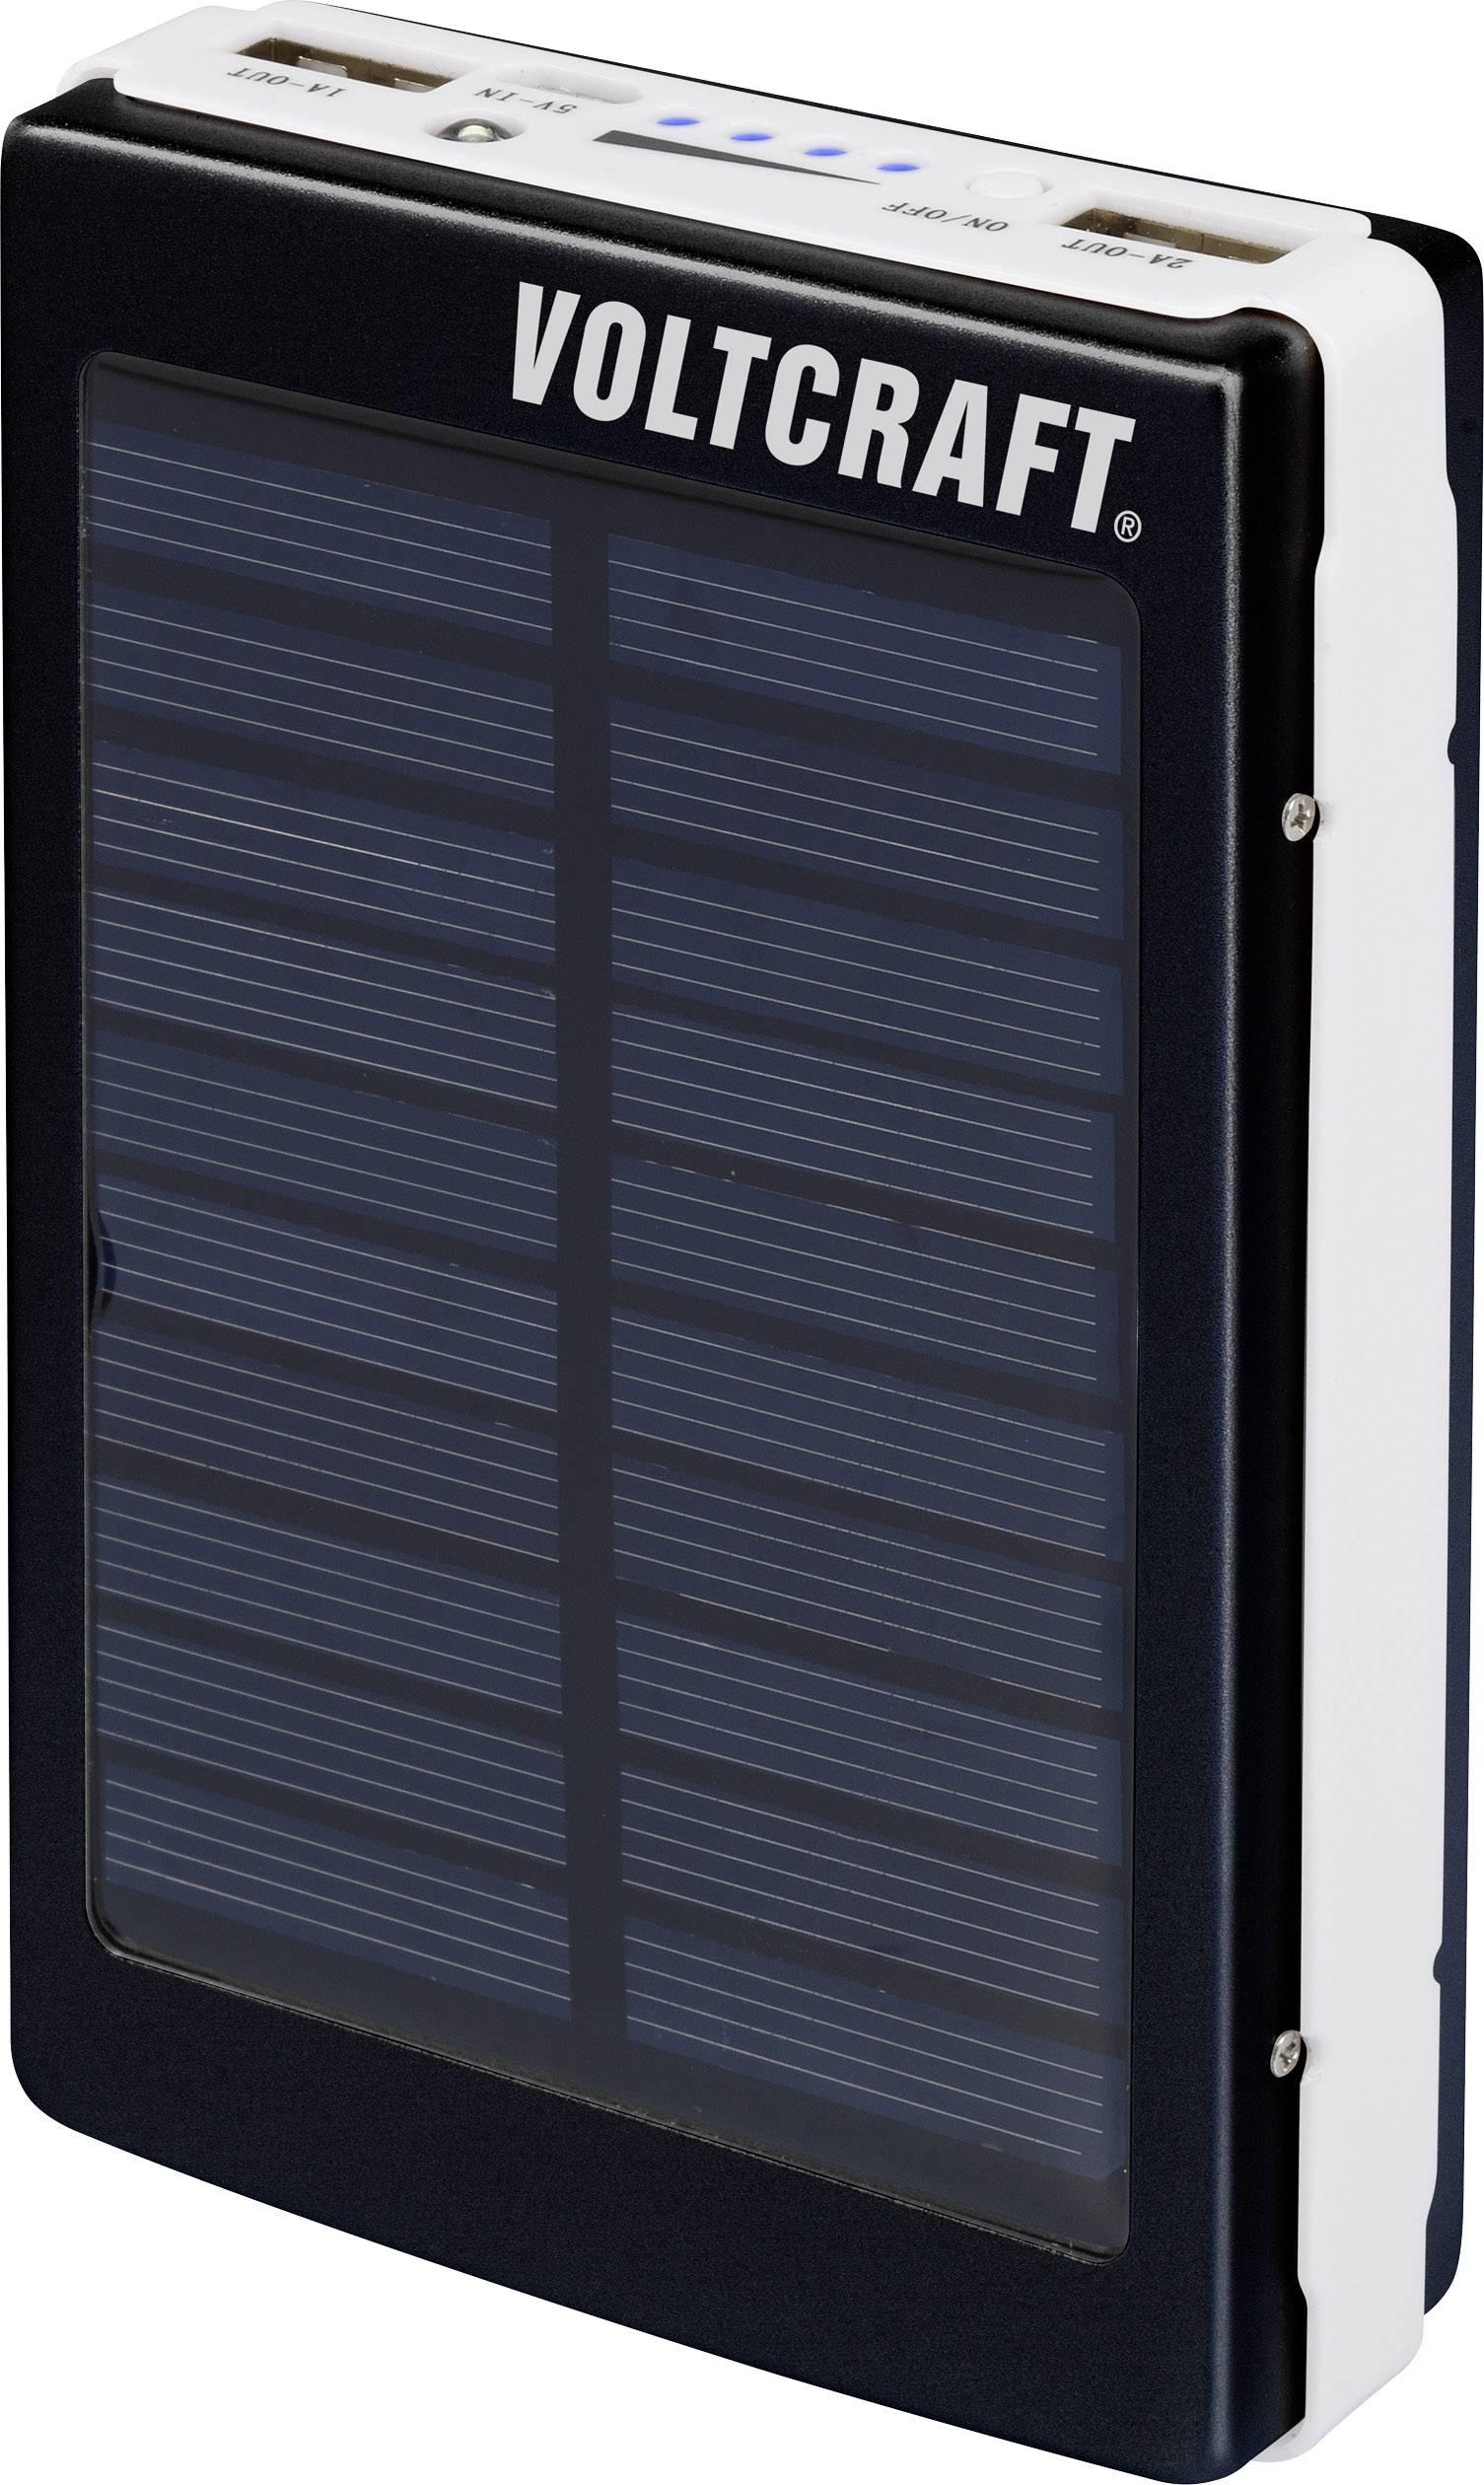 Solárna powerbanka s LED svetlom VOLTCRAFT PB-21, 13000 mAh, čiernobiela